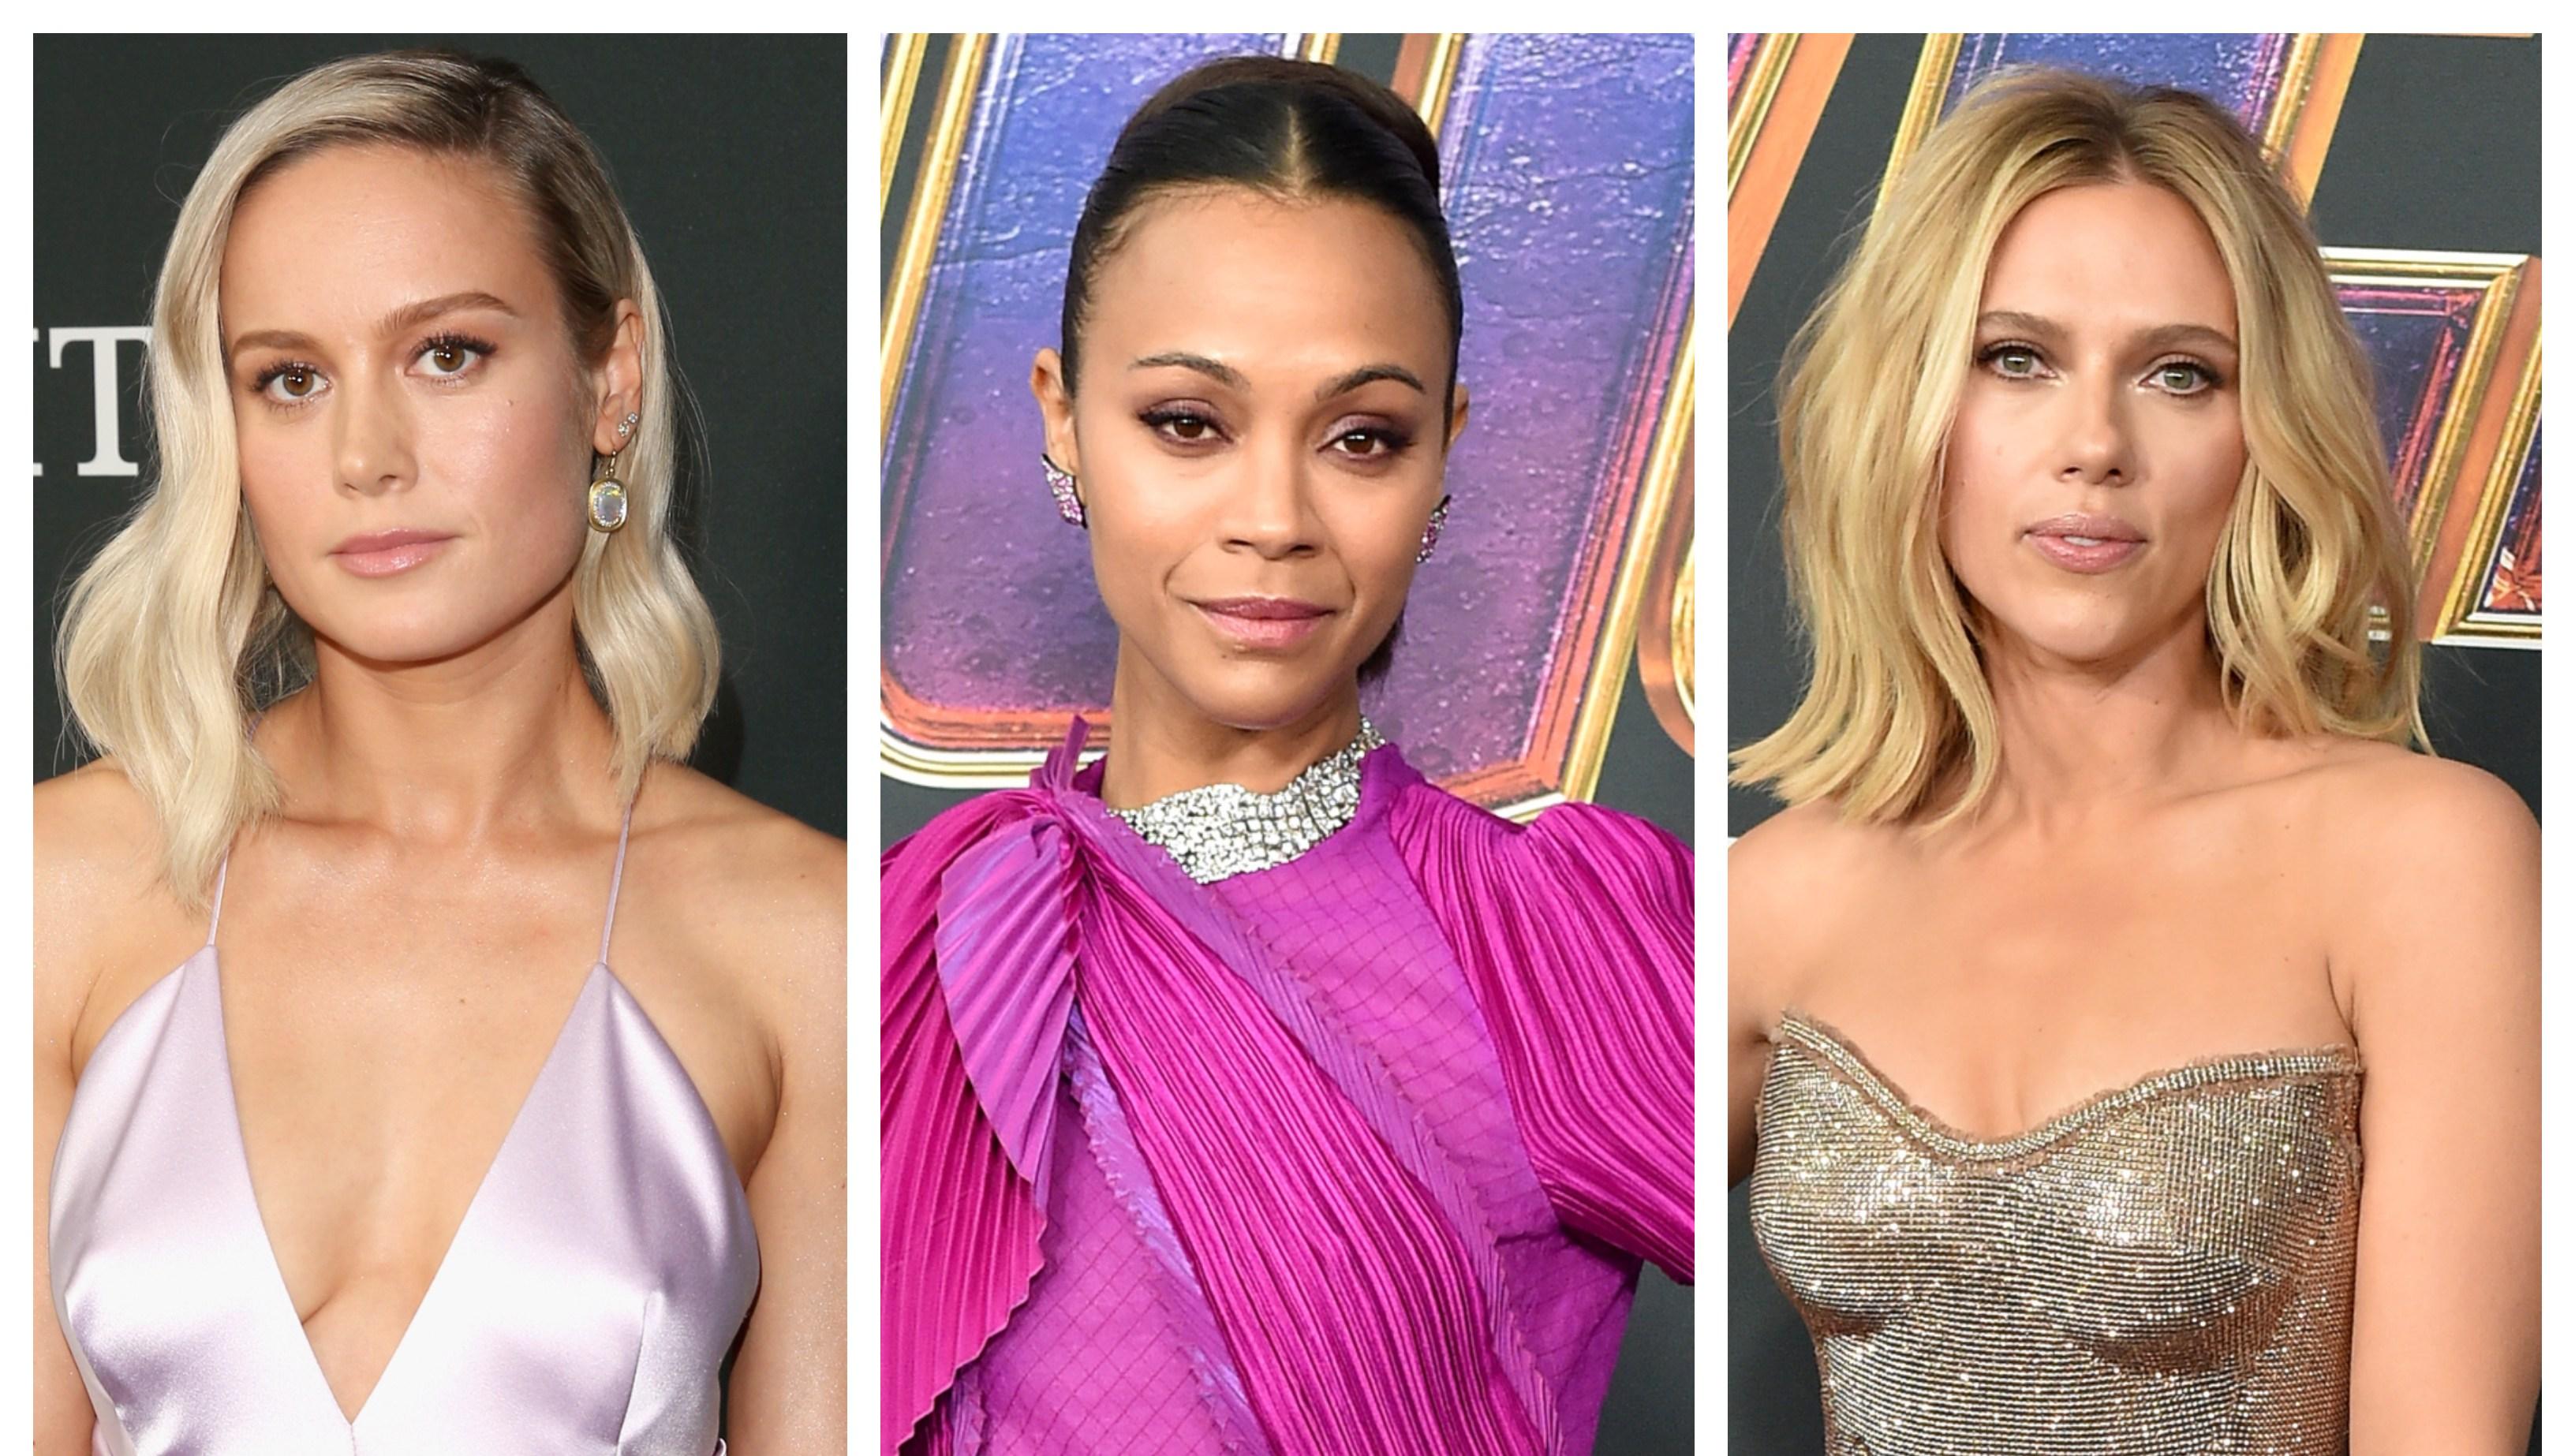 A split image of Brie Larson, Zoe Saldana and Scarlett Johansson